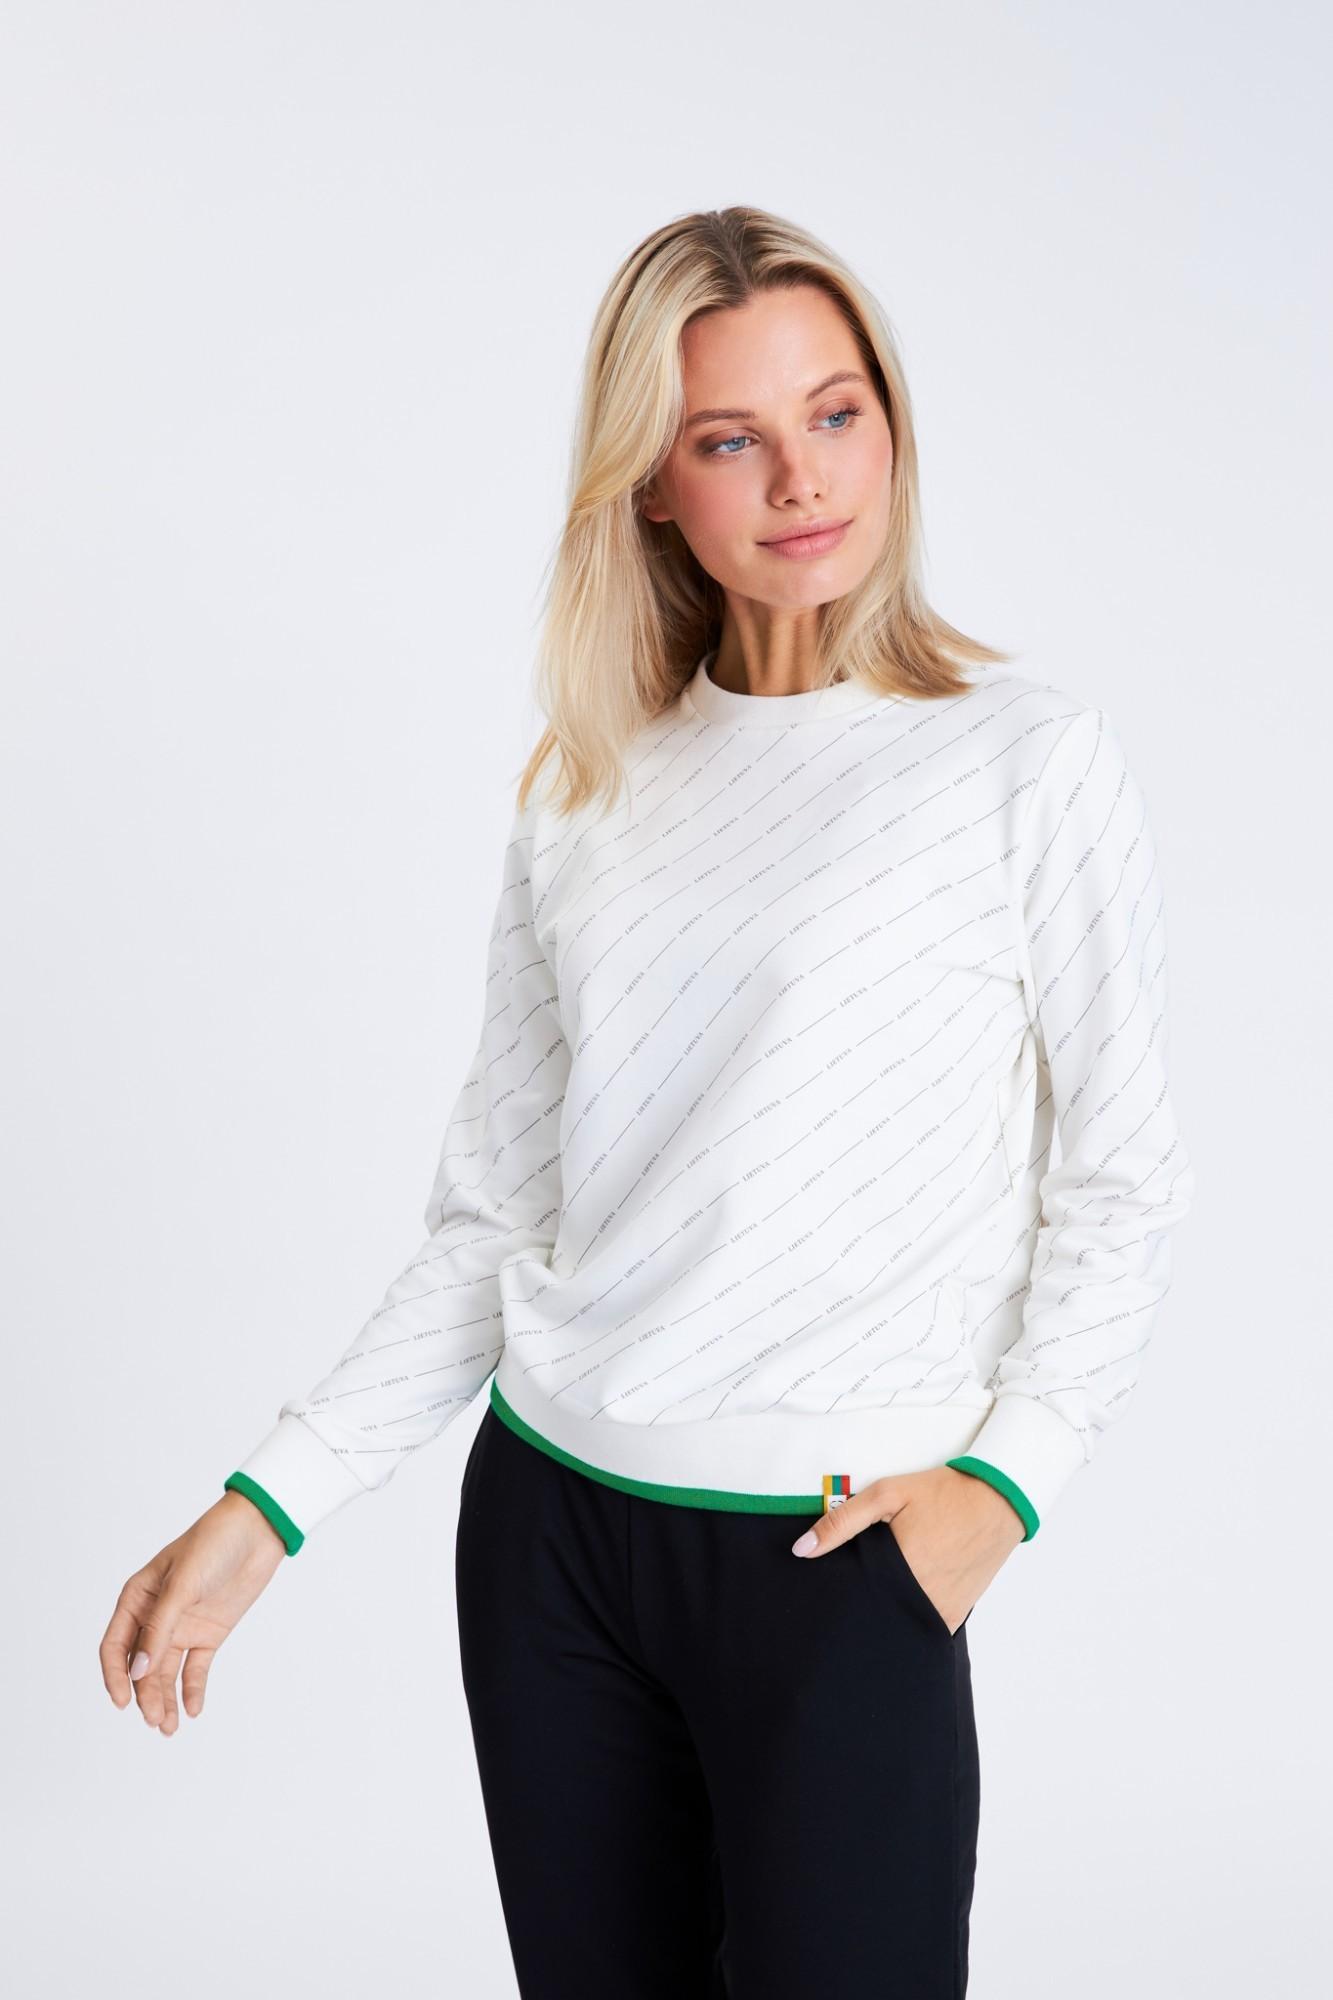 AUDIMAS Tamprus margintas medviln. džemp. 21LT-009 Blanc De Blanc XS